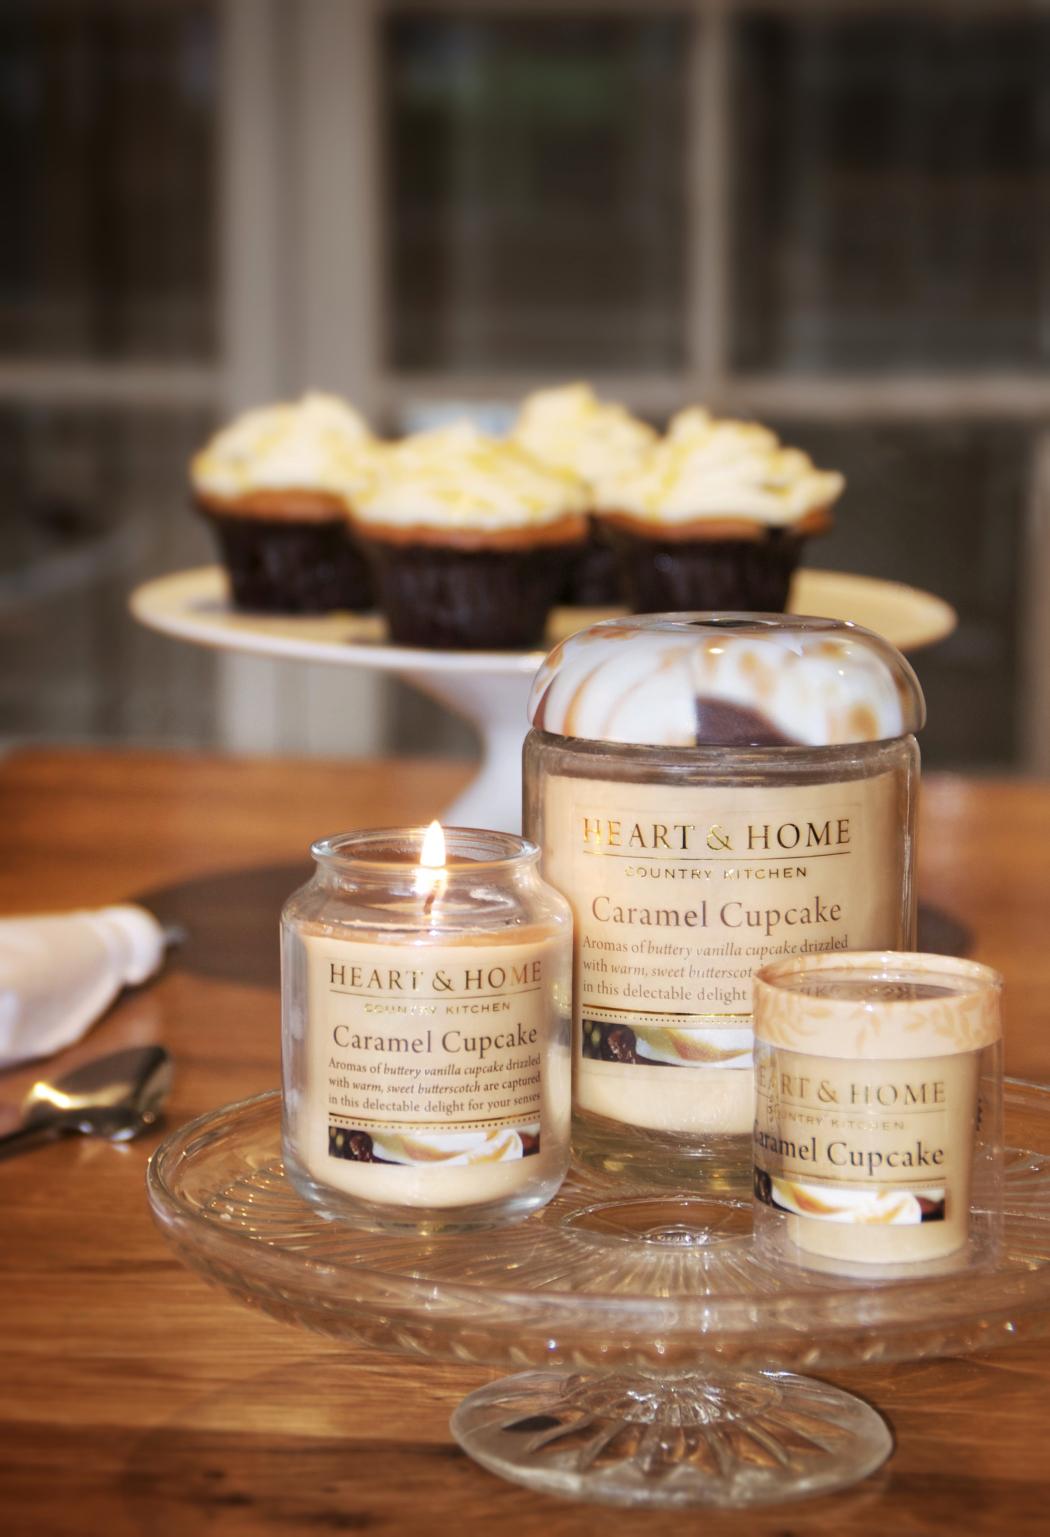 HEARTHOME-caramel-cupcake-1050x1537